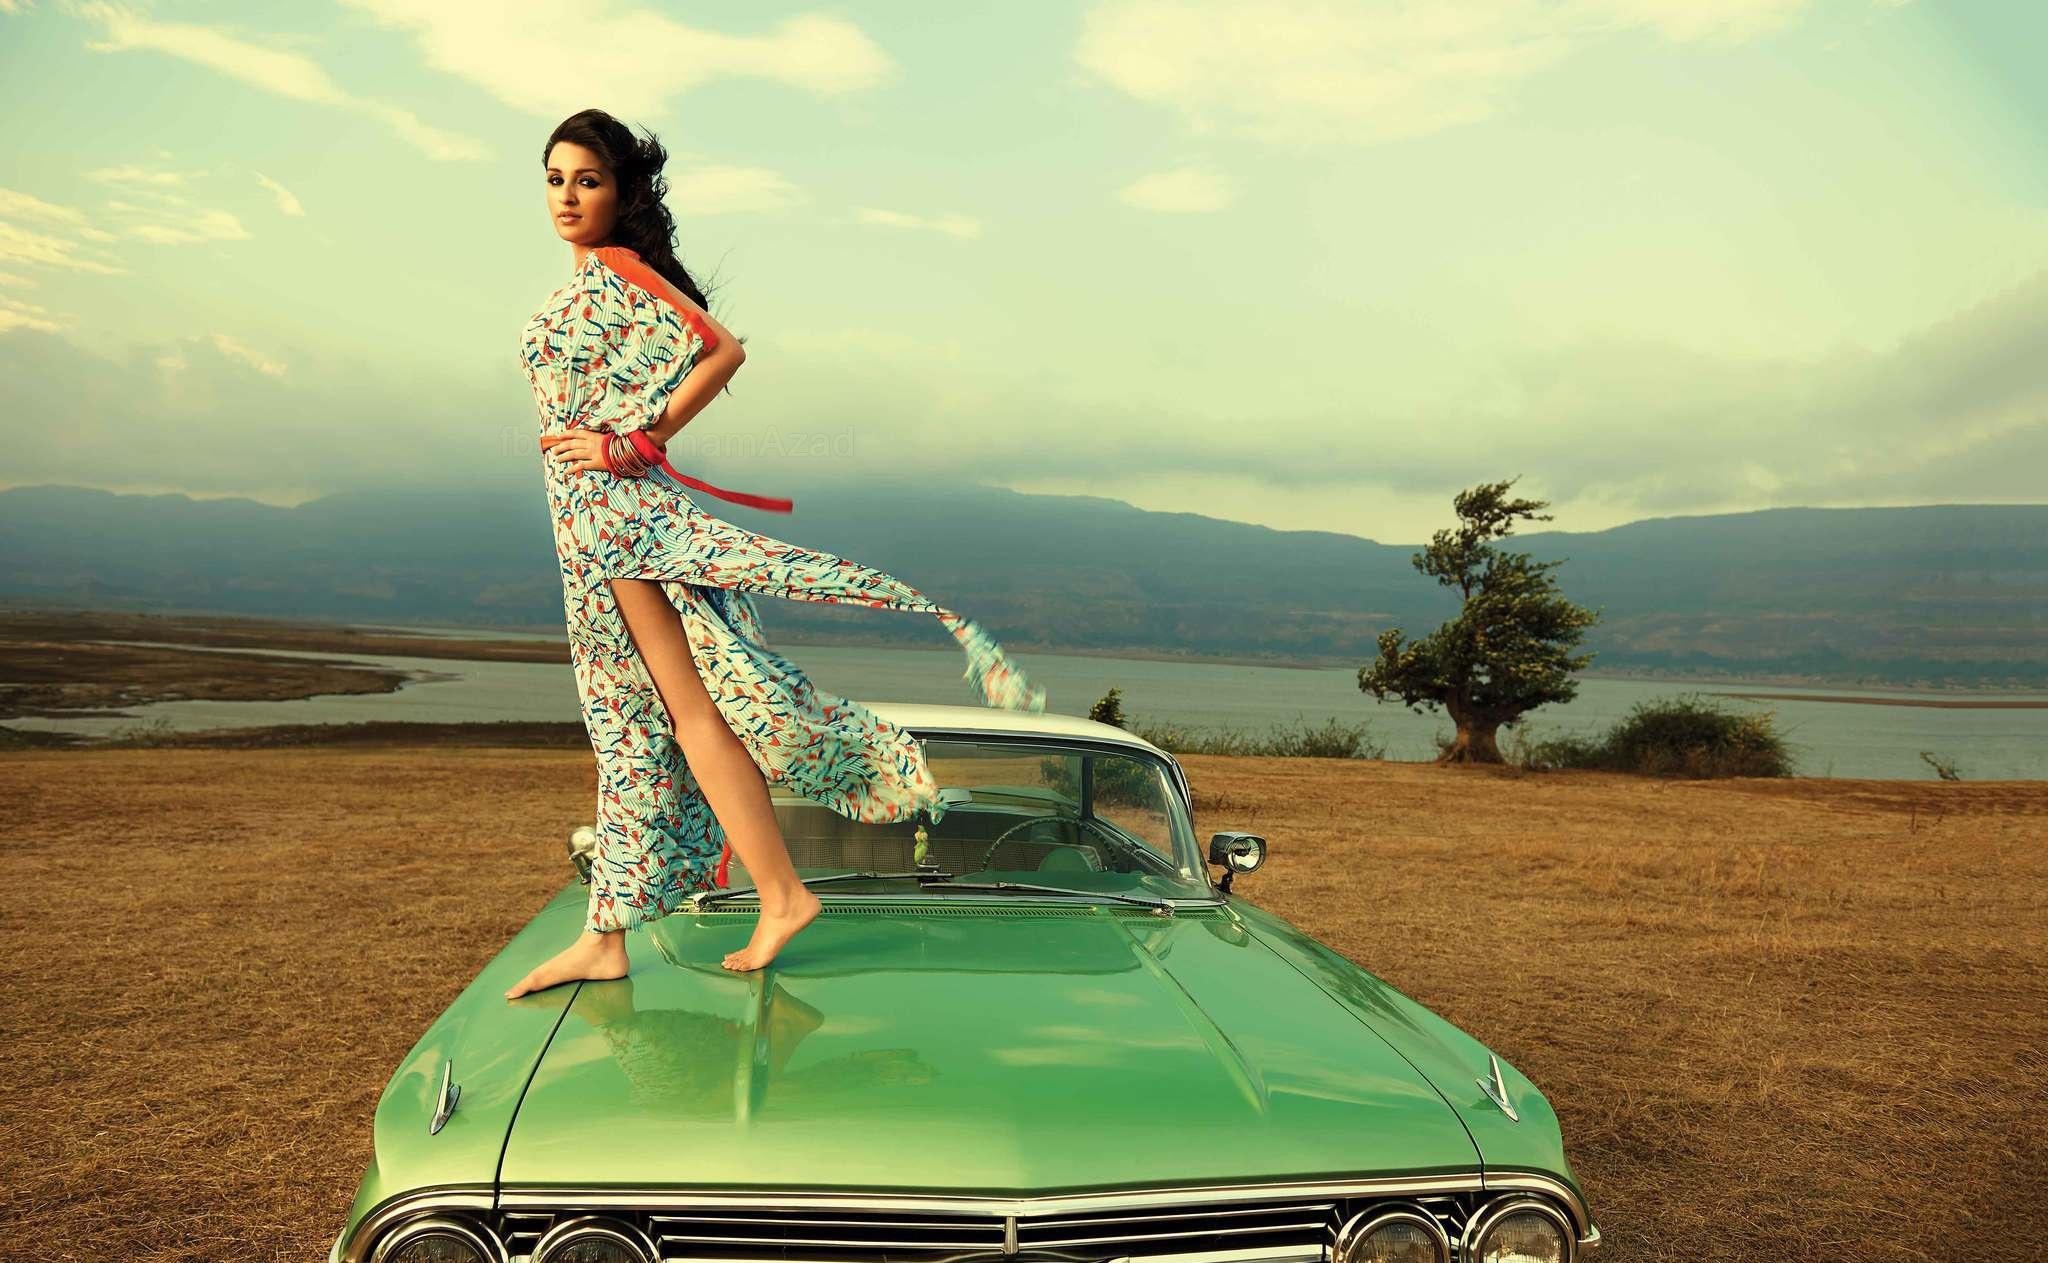 Parineeti Chopra With Car Wallpapers Facebook Cover Popopics Com